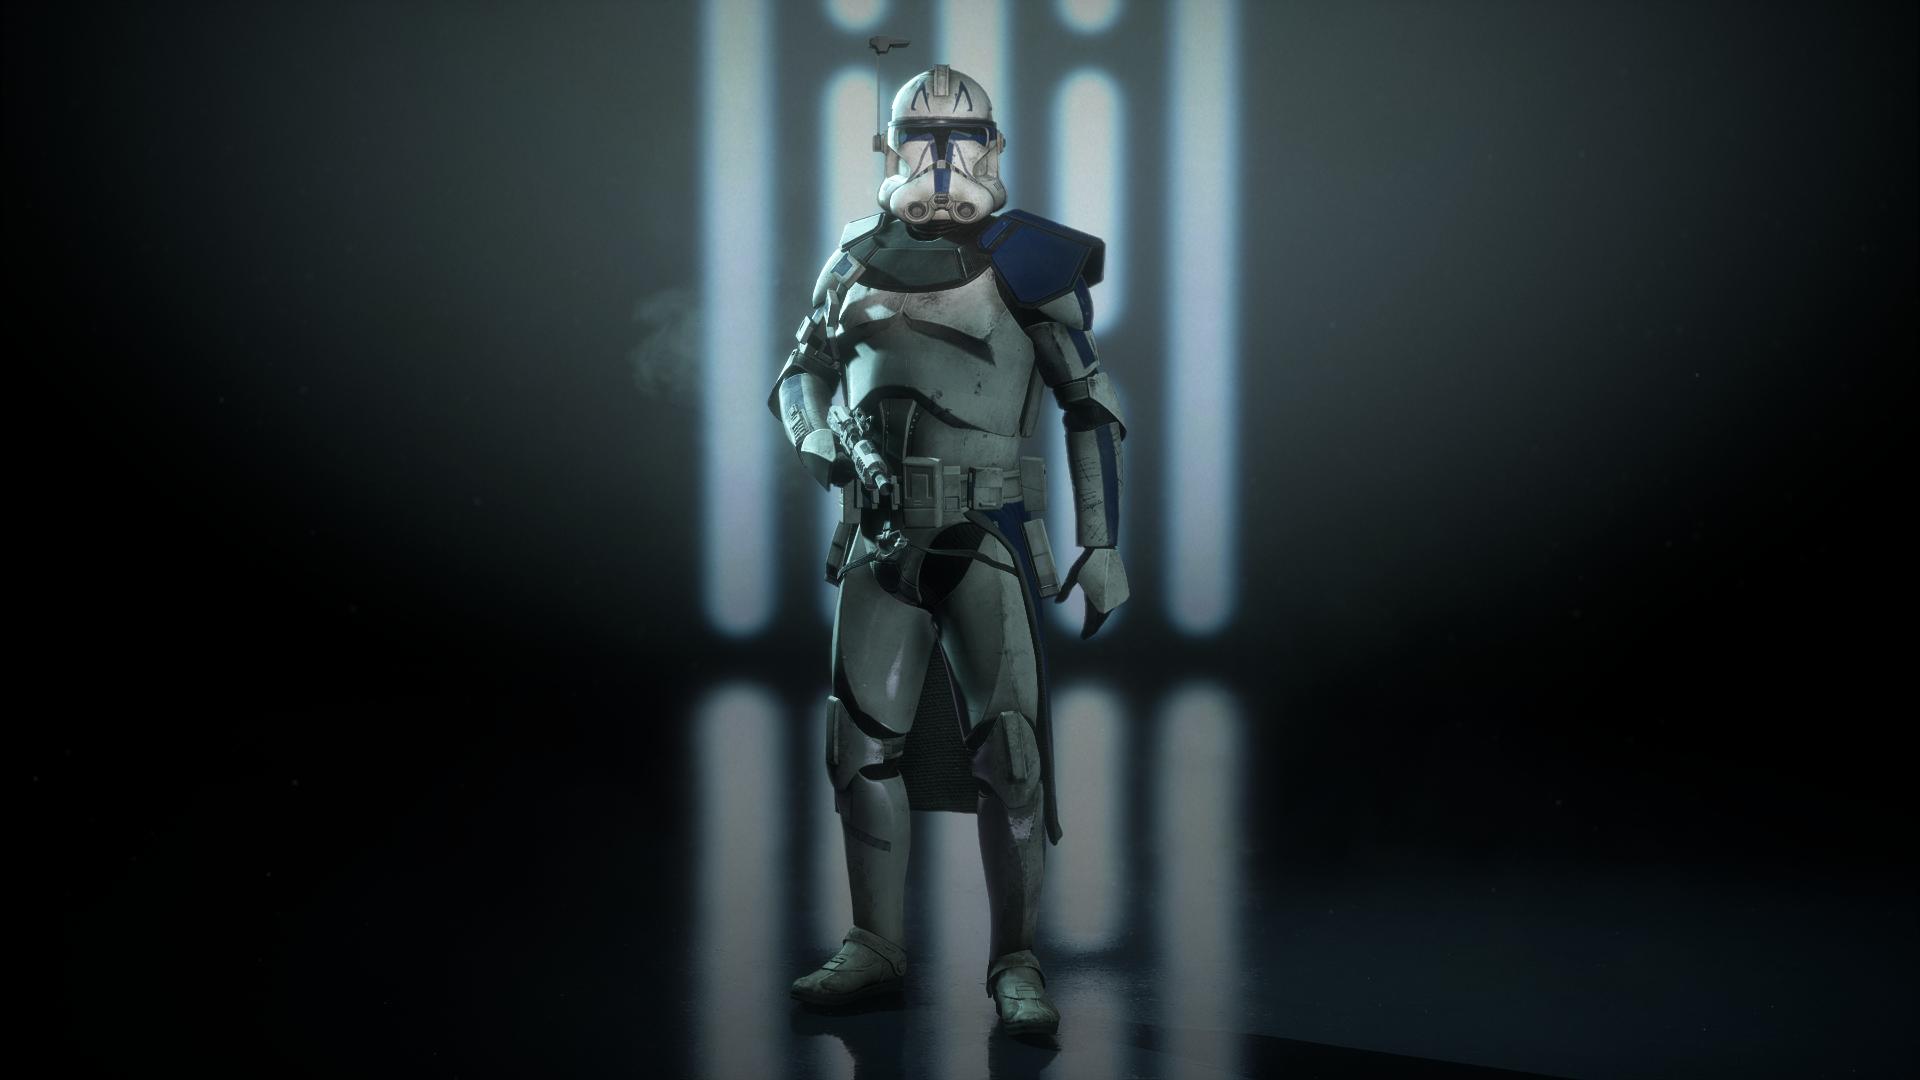 Captain Rex Phase 2 At Star Wars Battlefront Ii 2017 Nexus Mods And Community Star Wars Games Captain Battlefront